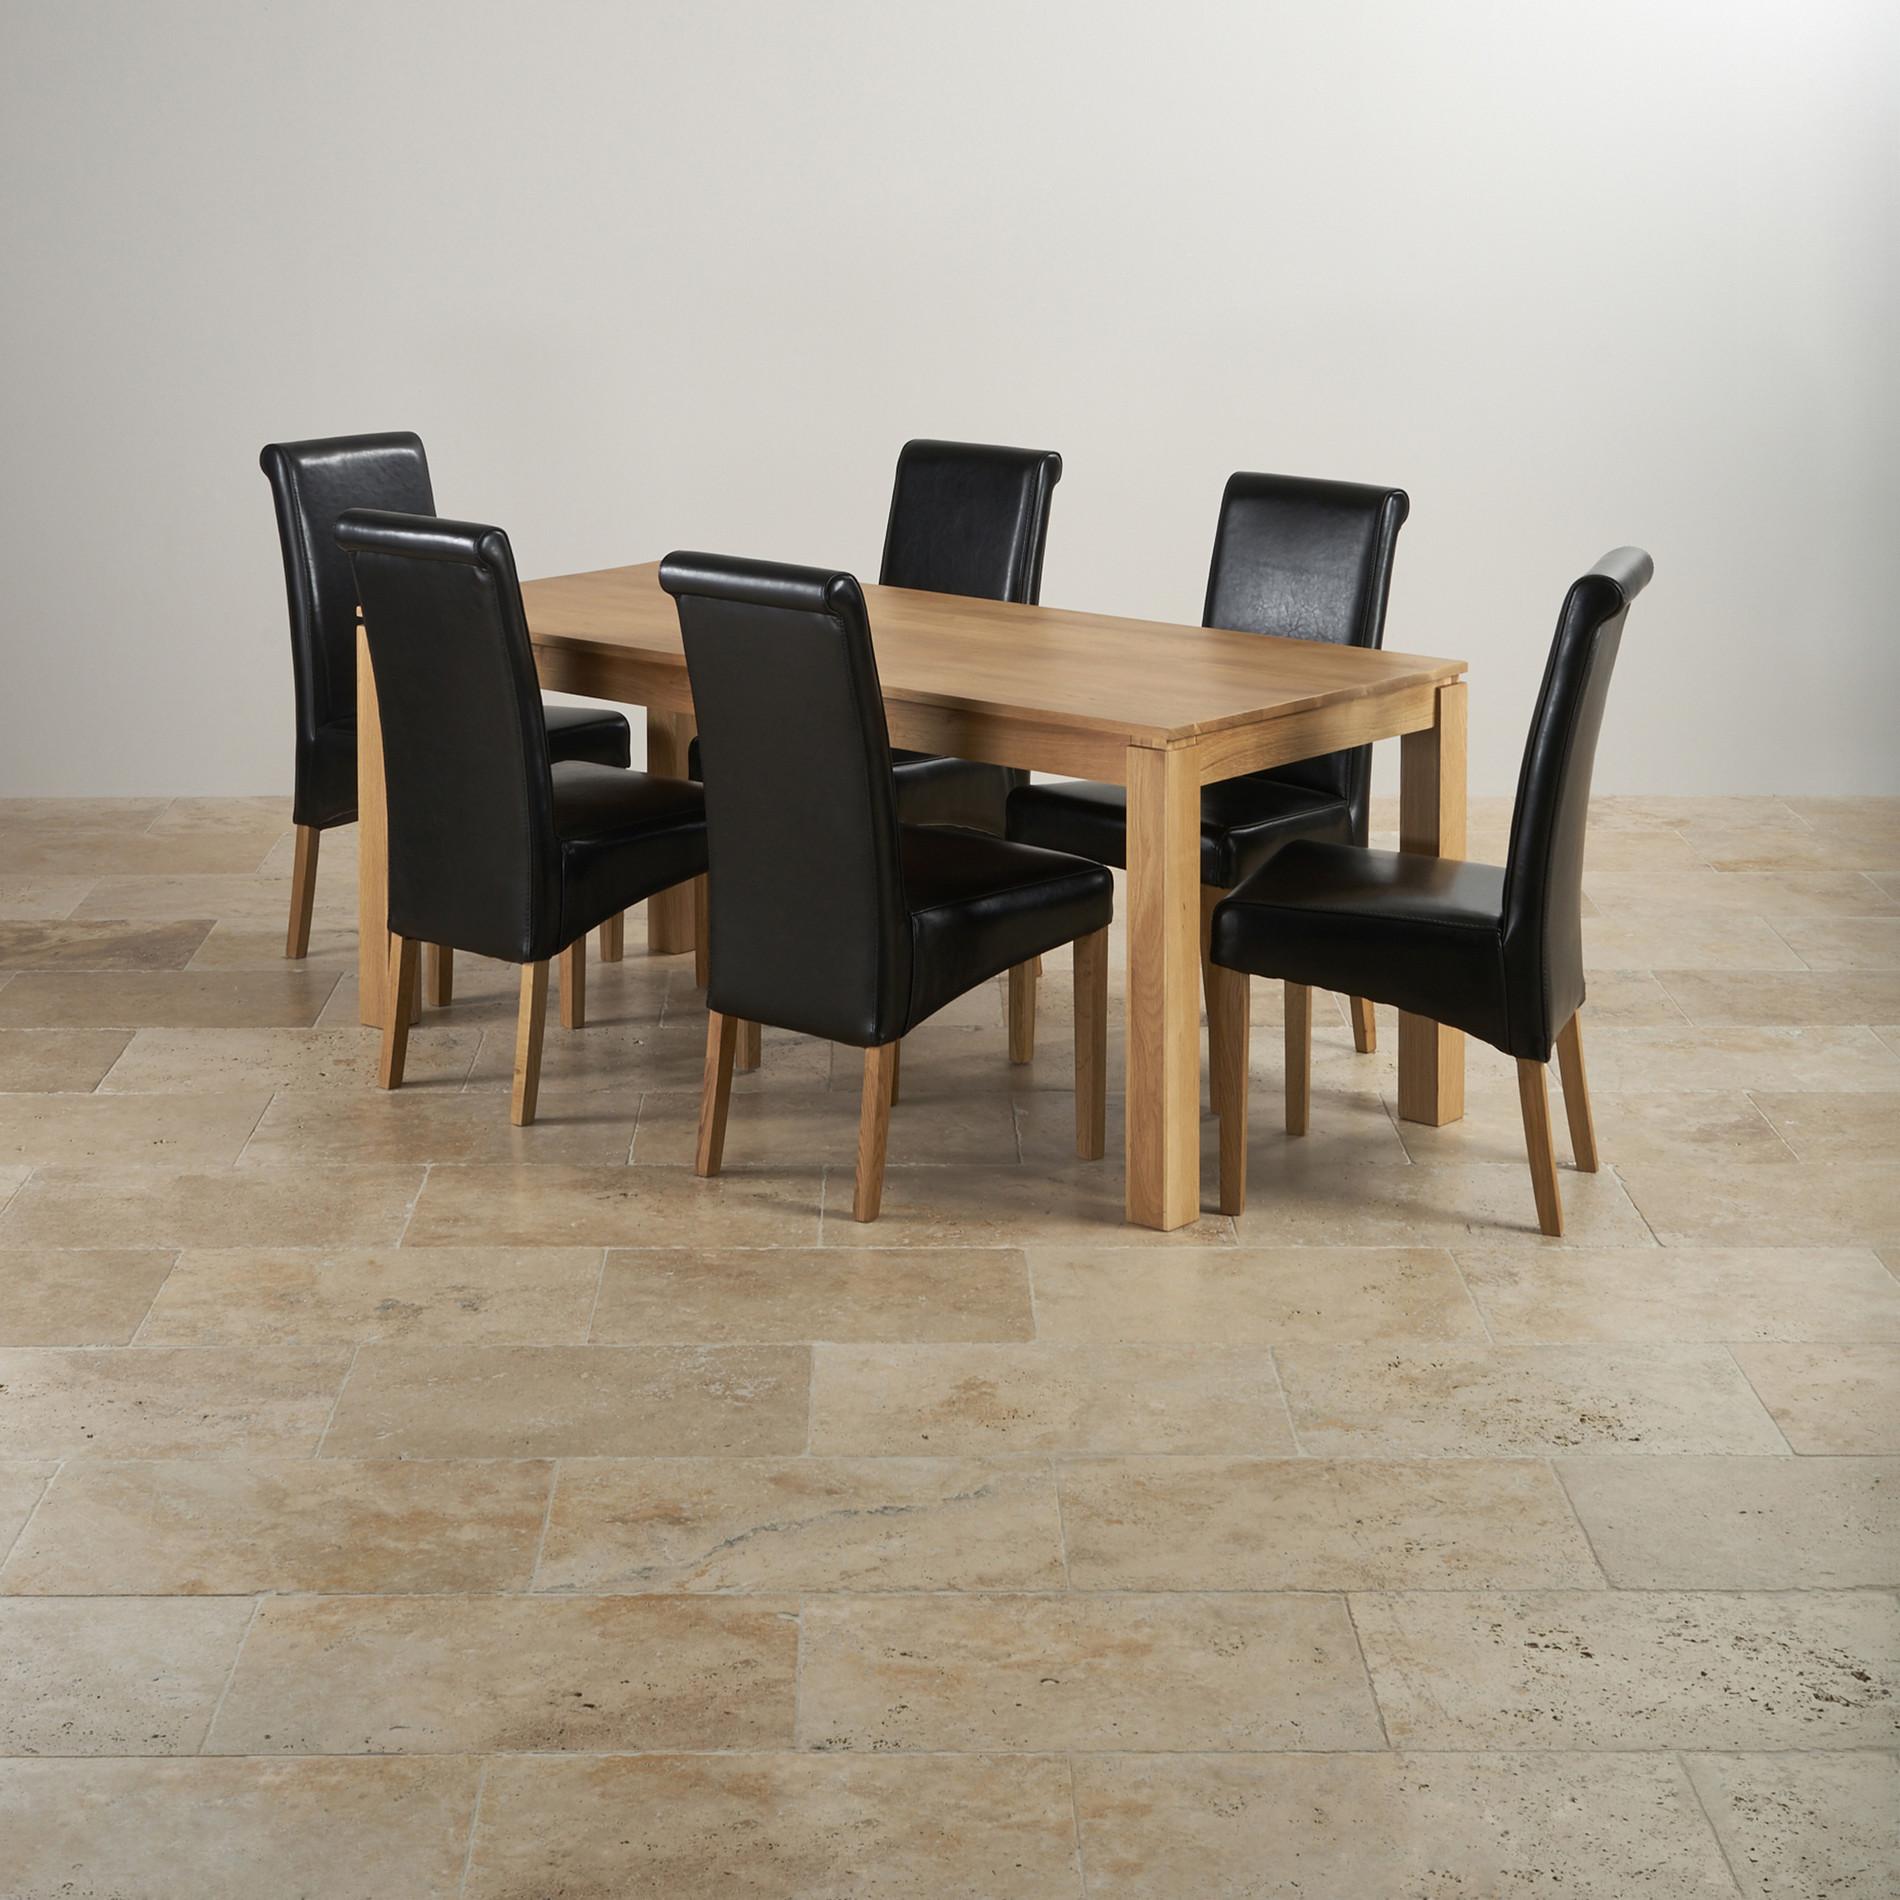 Office furniture galway - Popular Bespoke Office Furniture